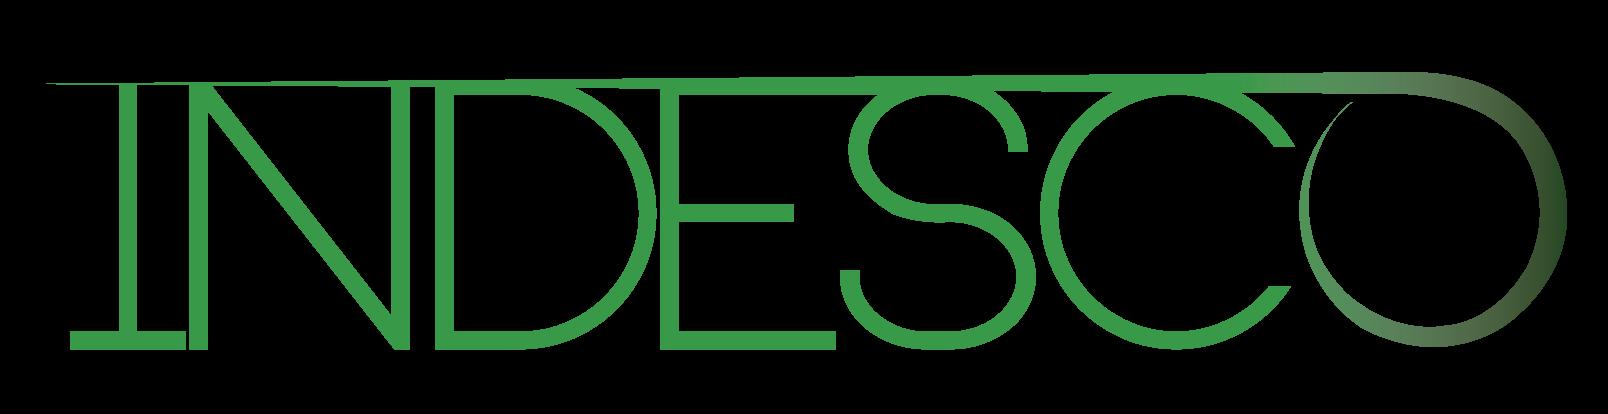 Logo_INDESCO_2016_color sin fondo-03